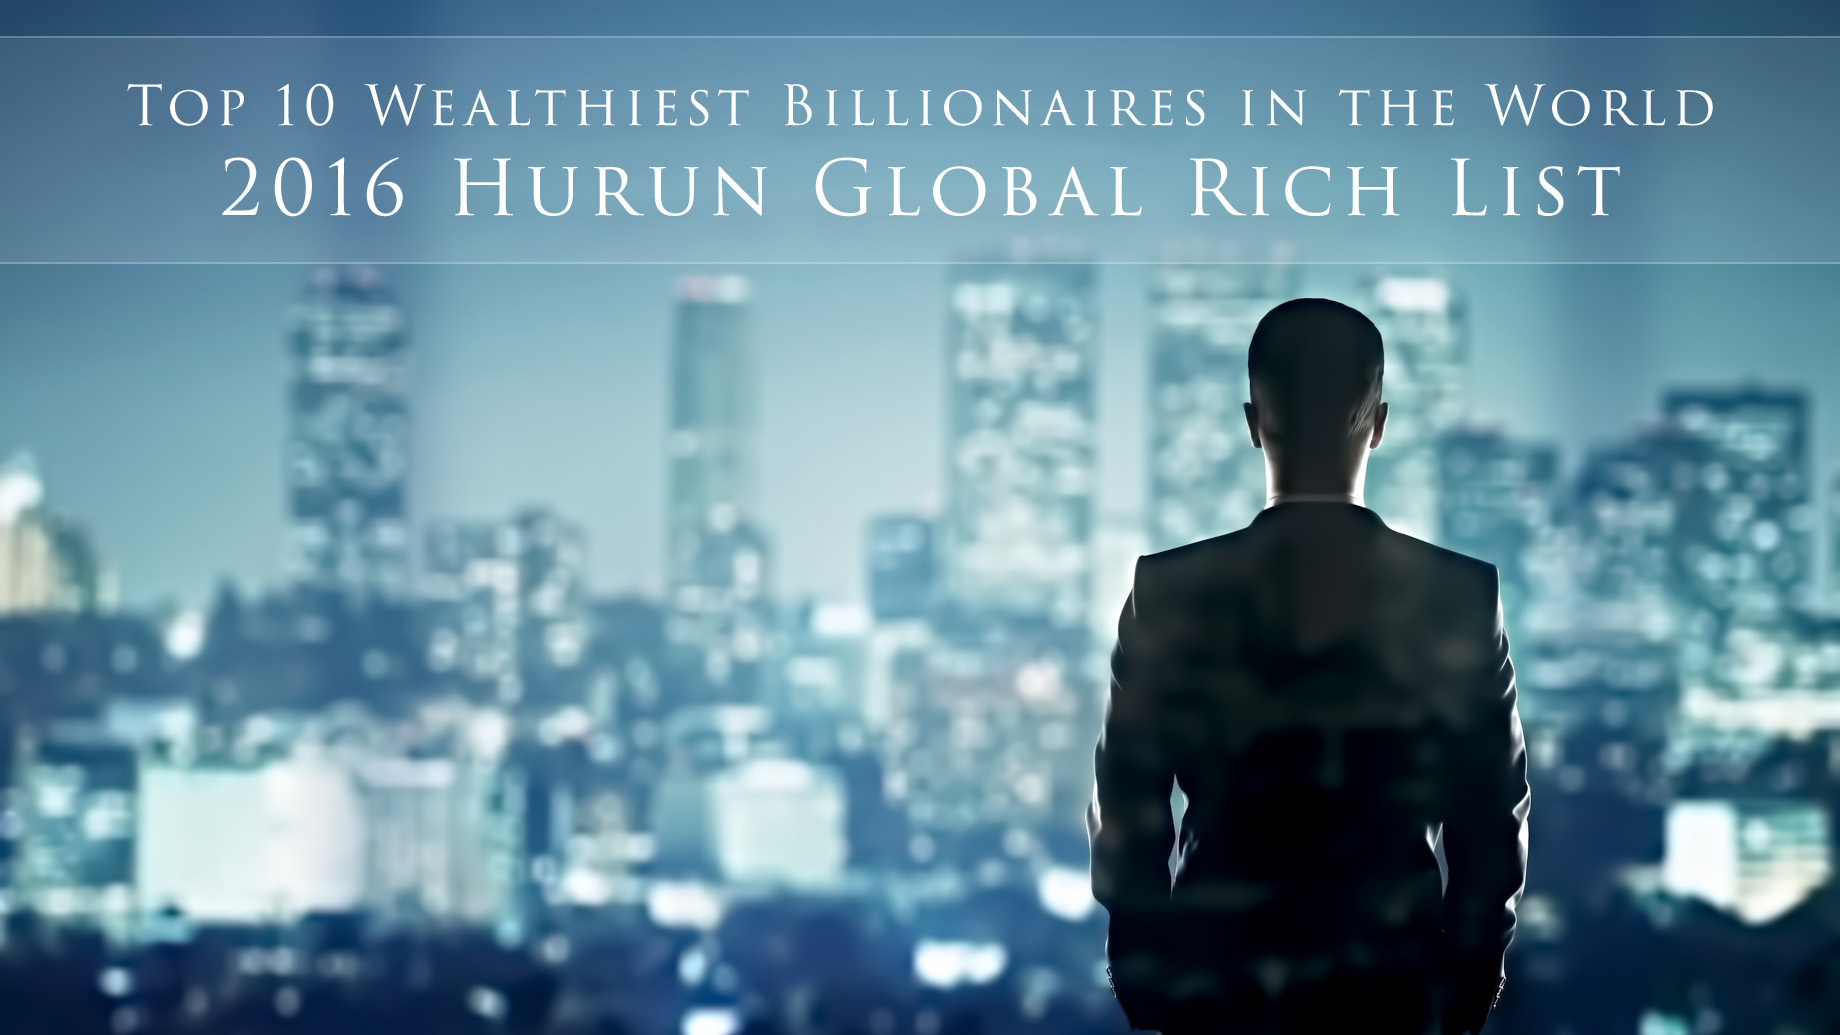 Top 10 Wealthiest Billionaires in the World - 2016 Hurun Global Rich List